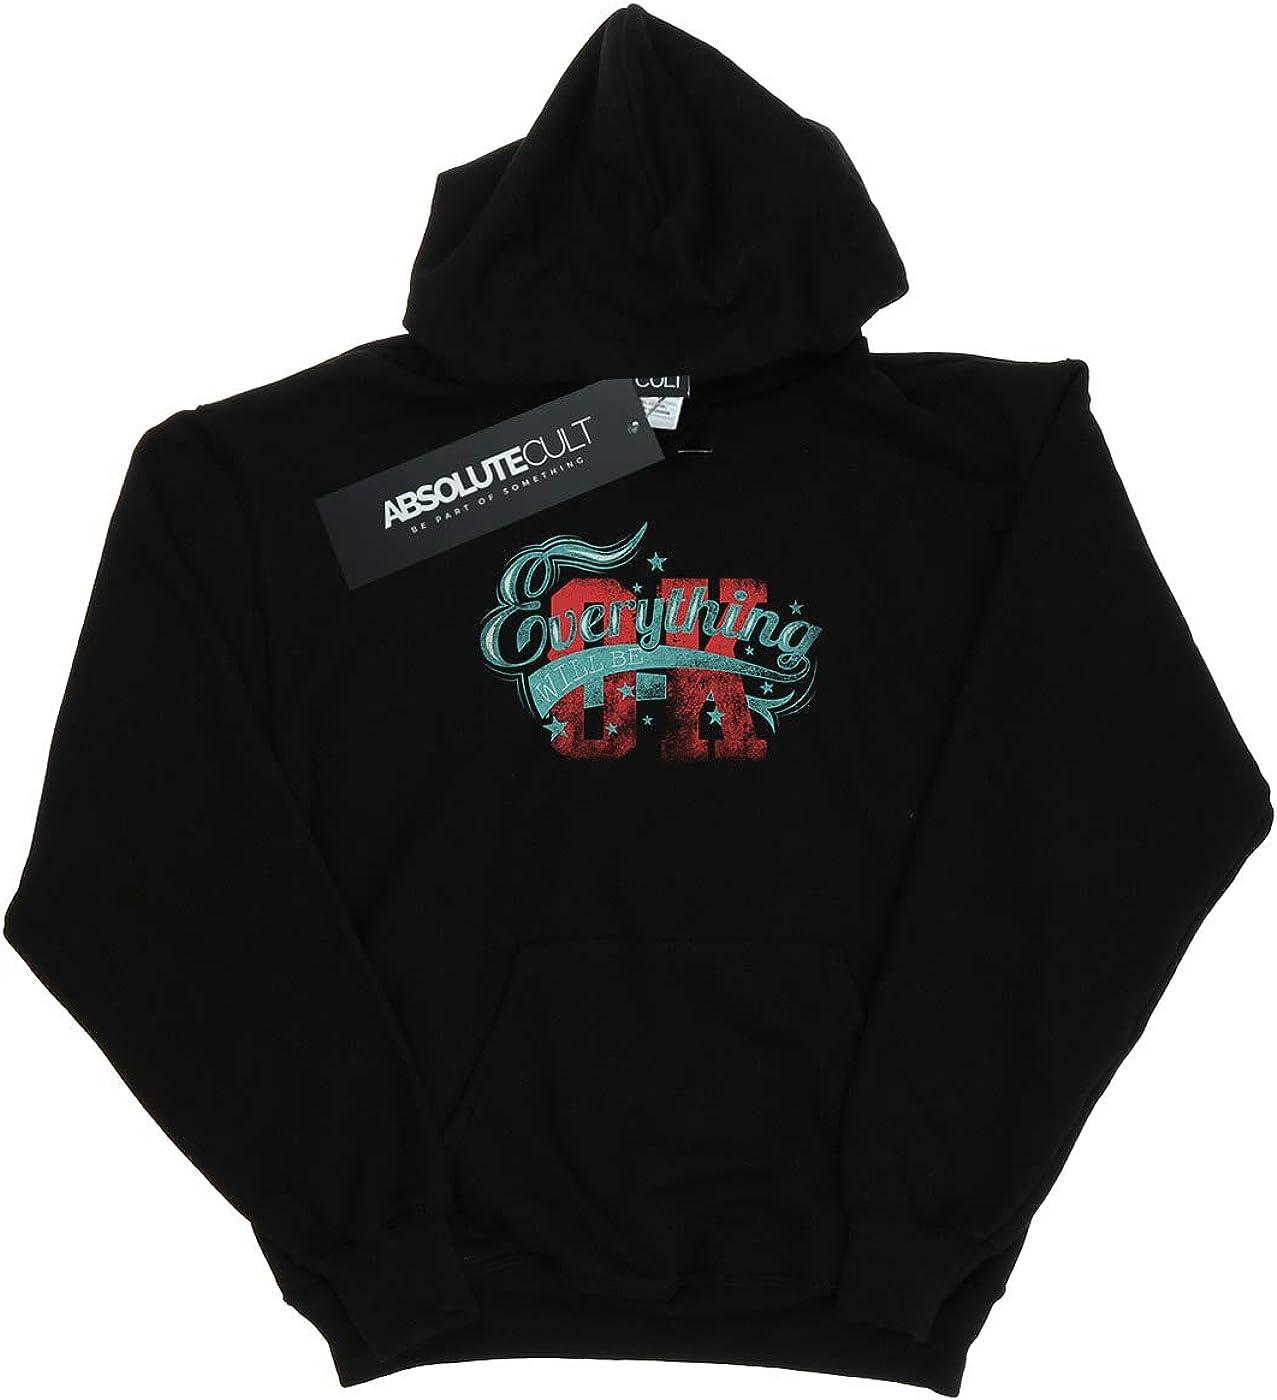 Absolute Cult Drewbacca Girls Everything Will Be OK Sweatshirt